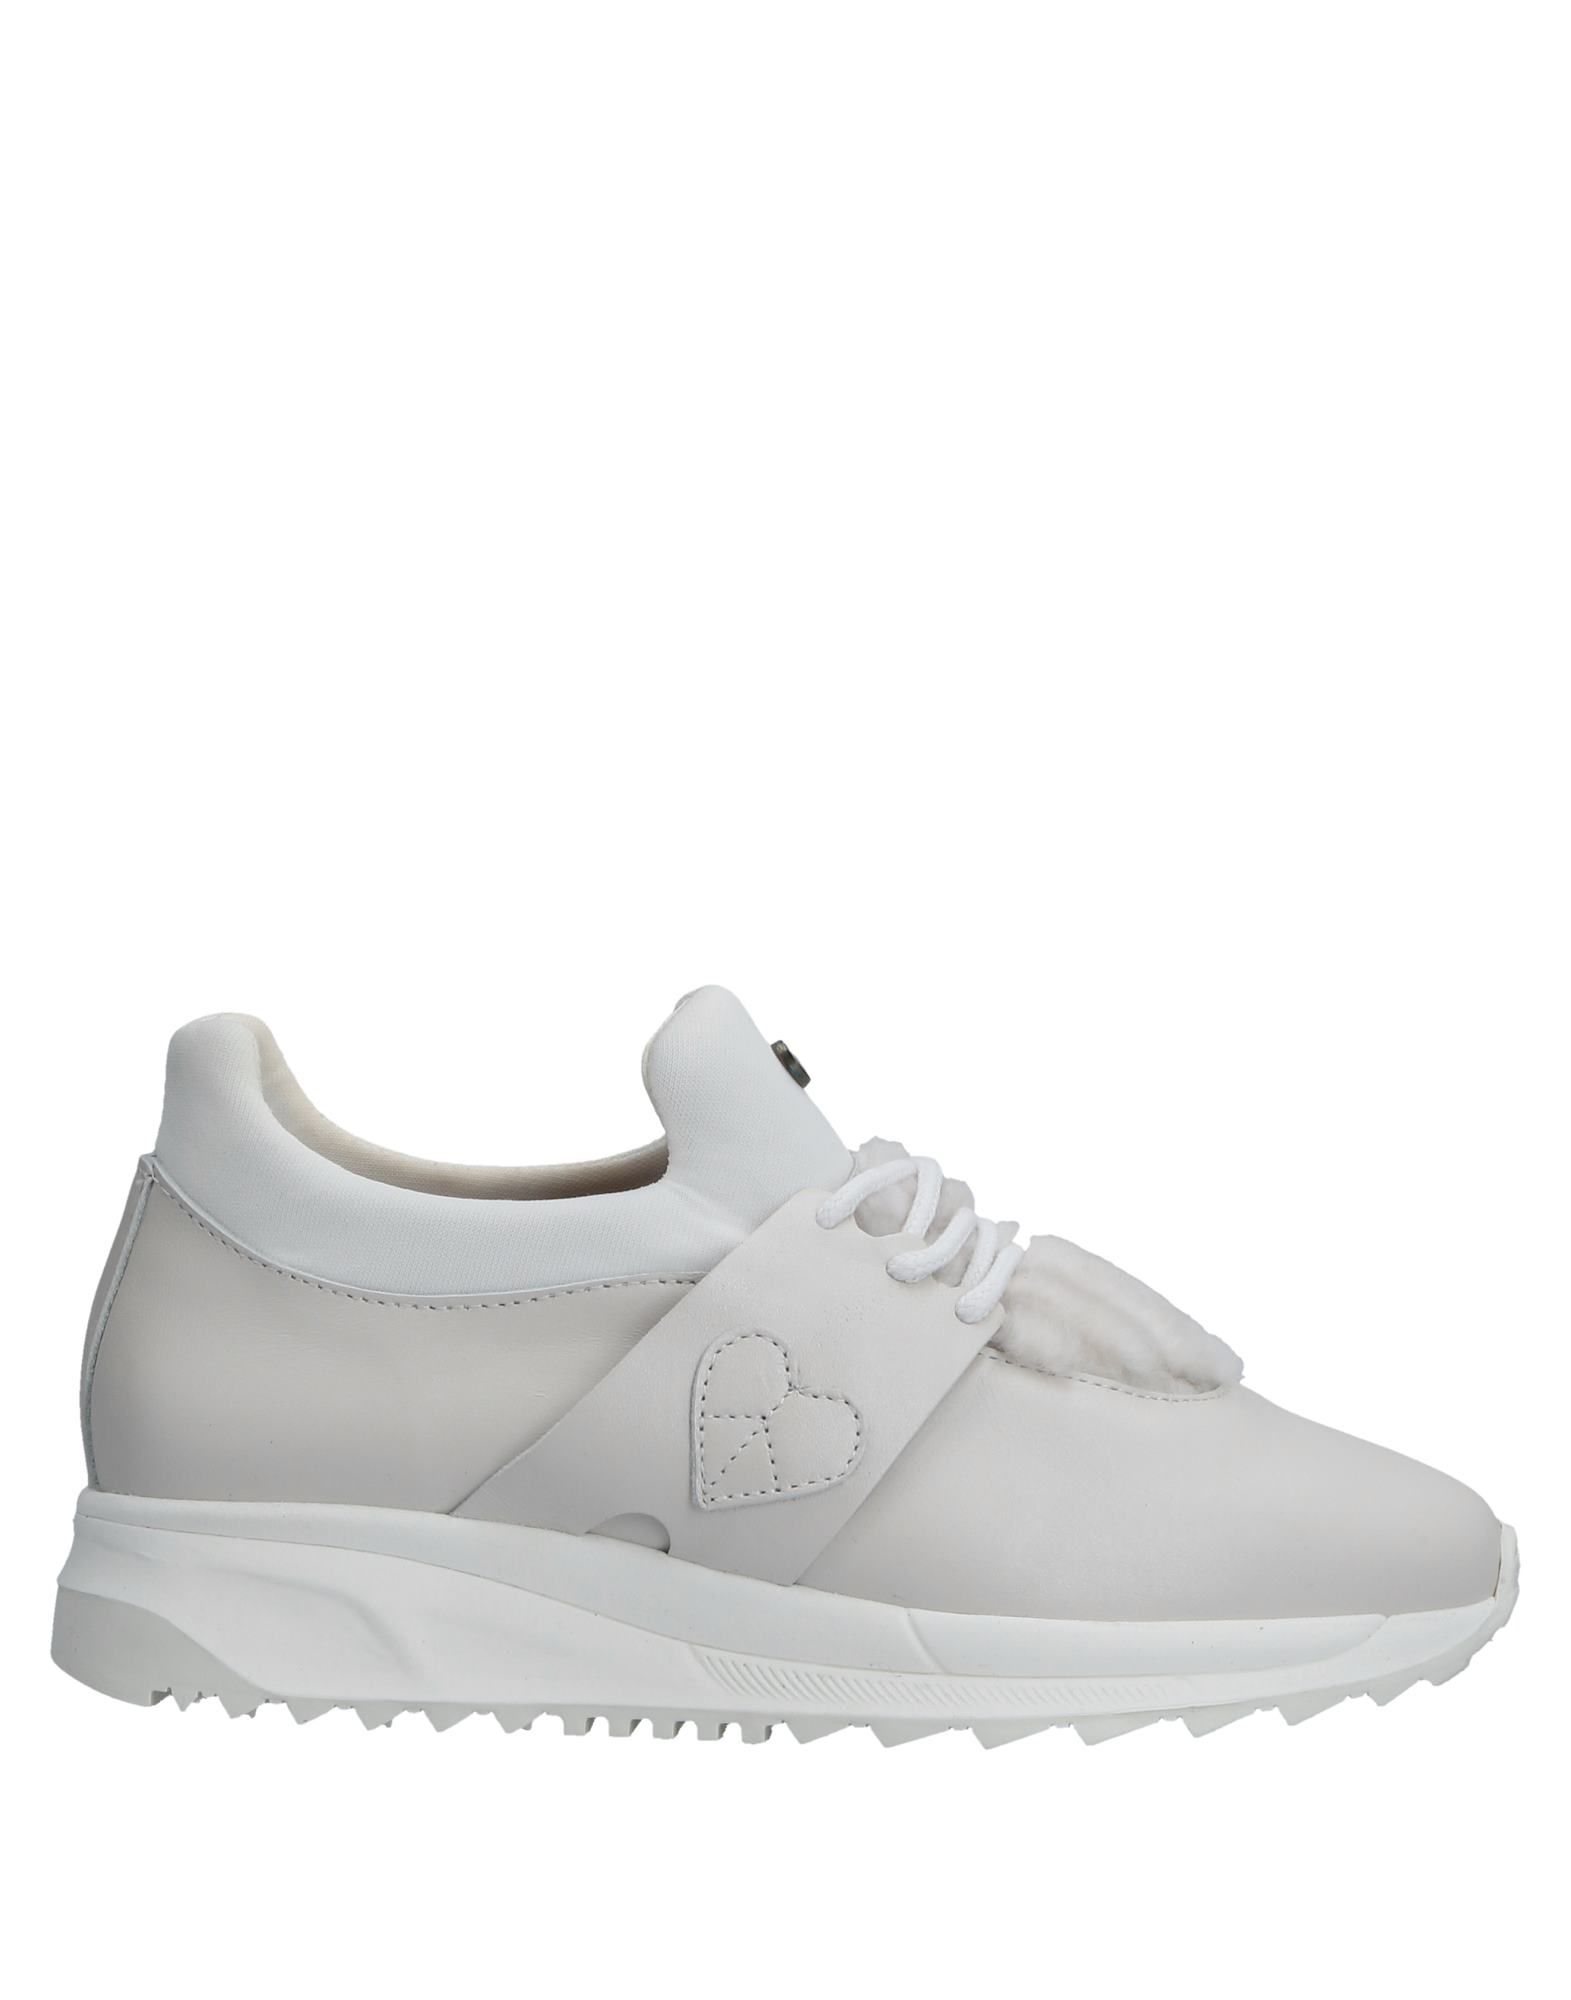 Dolfie Sneakers Damen  11527951QG Gute Qualität beliebte Schuhe